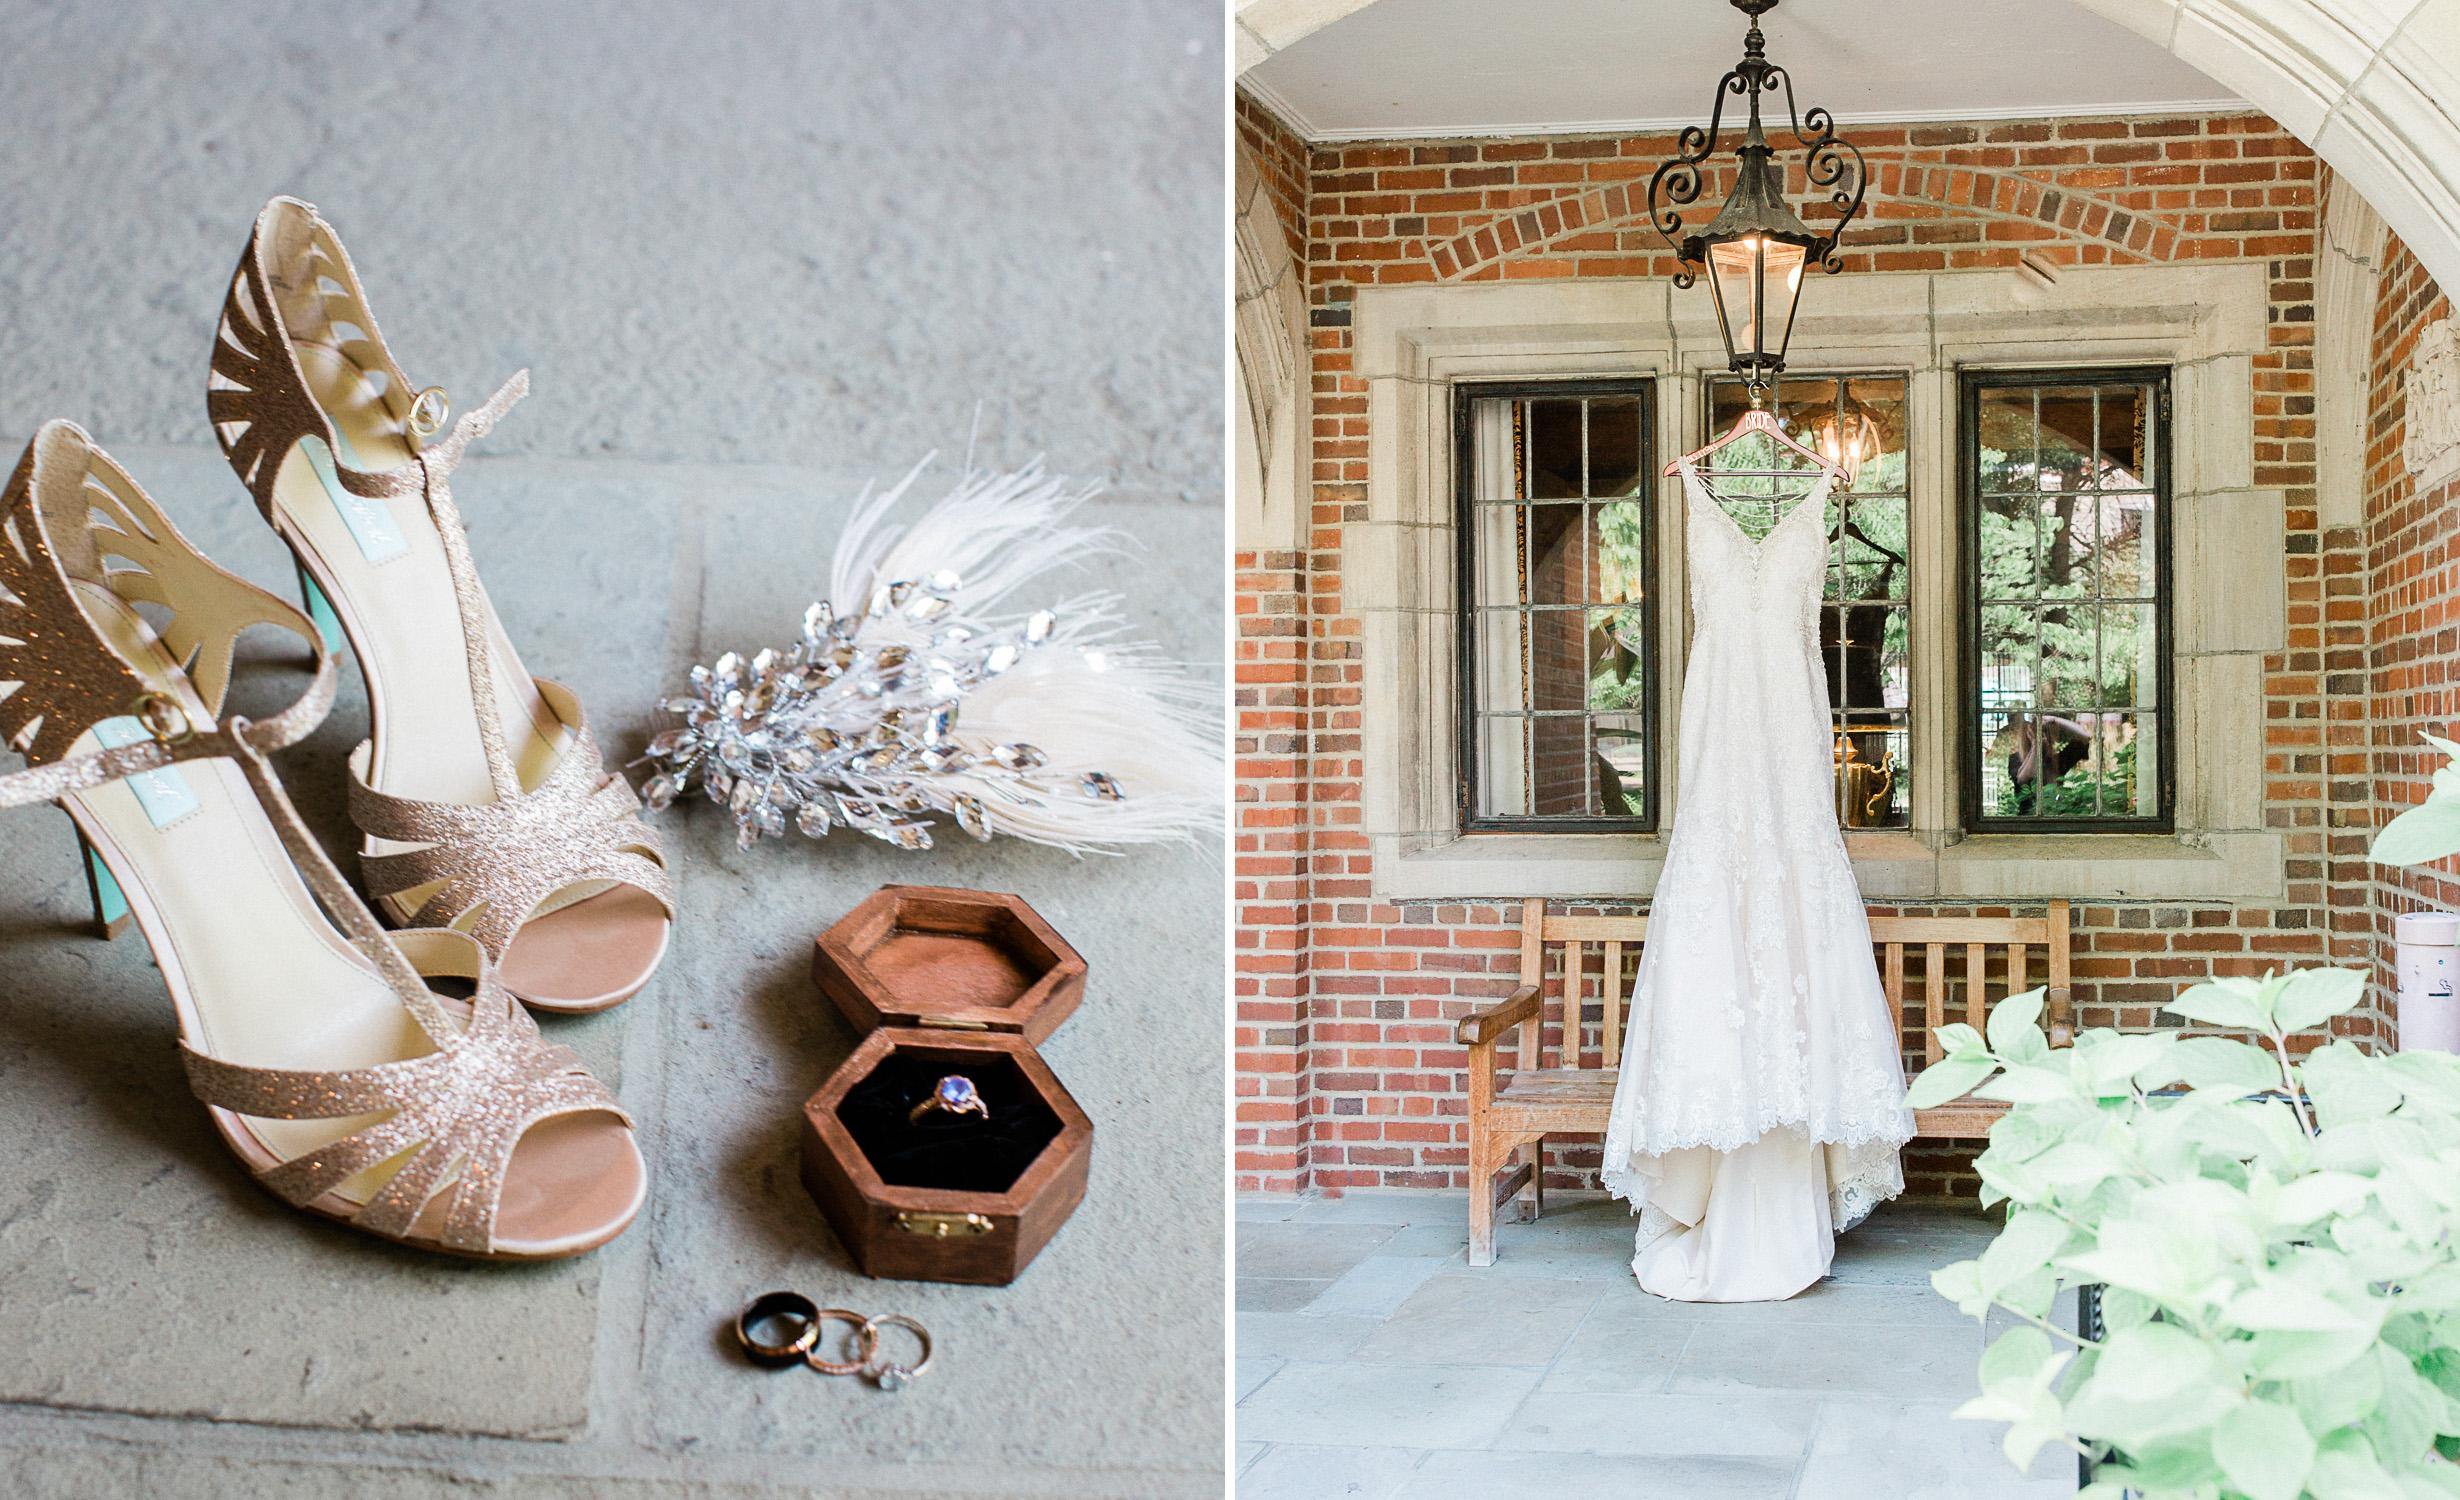 Dorothy_Louise_Photography_University_of_Chicago_Wedding1.jpg